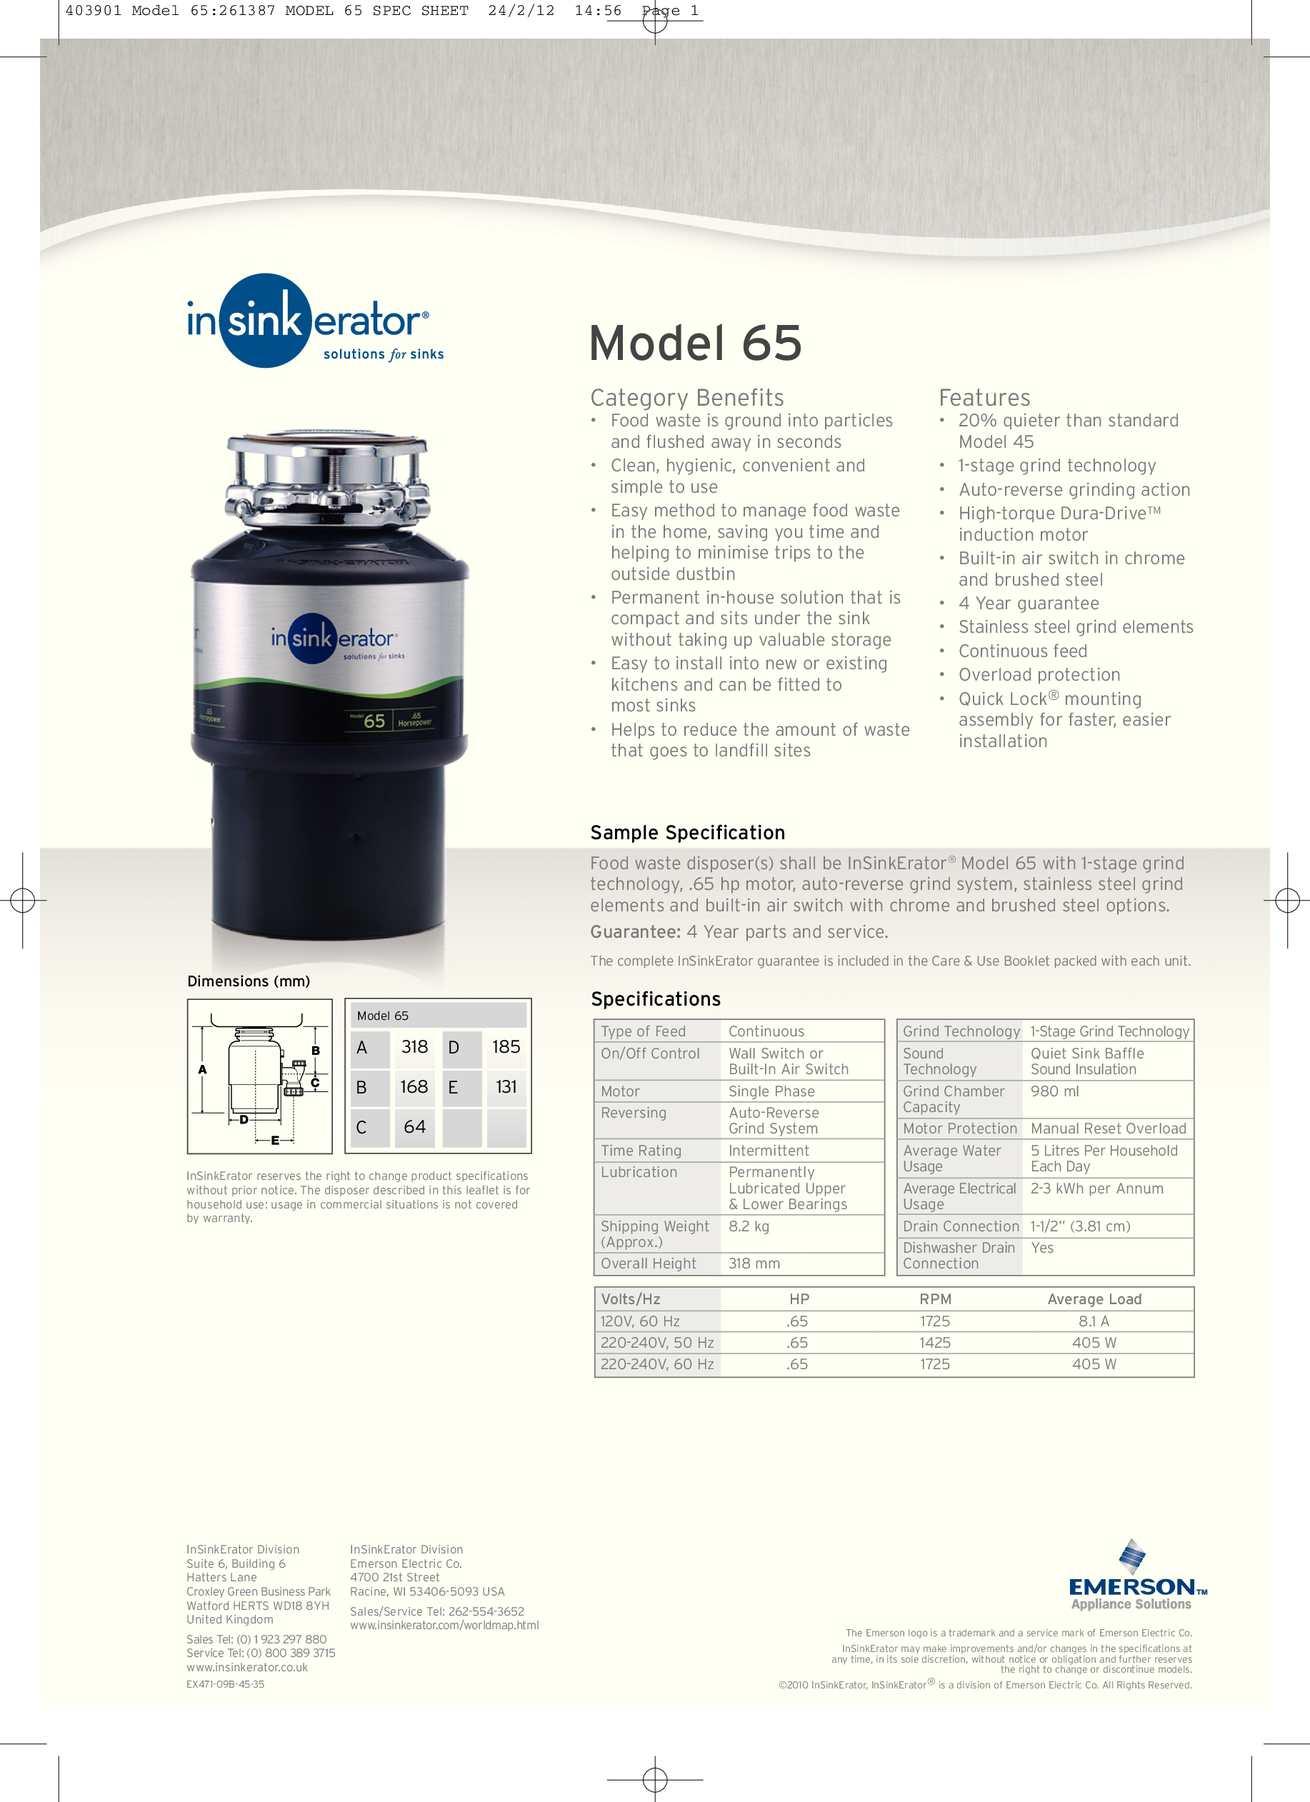 Calaméo   InSinkErator Model 40 Food Waste Disposer